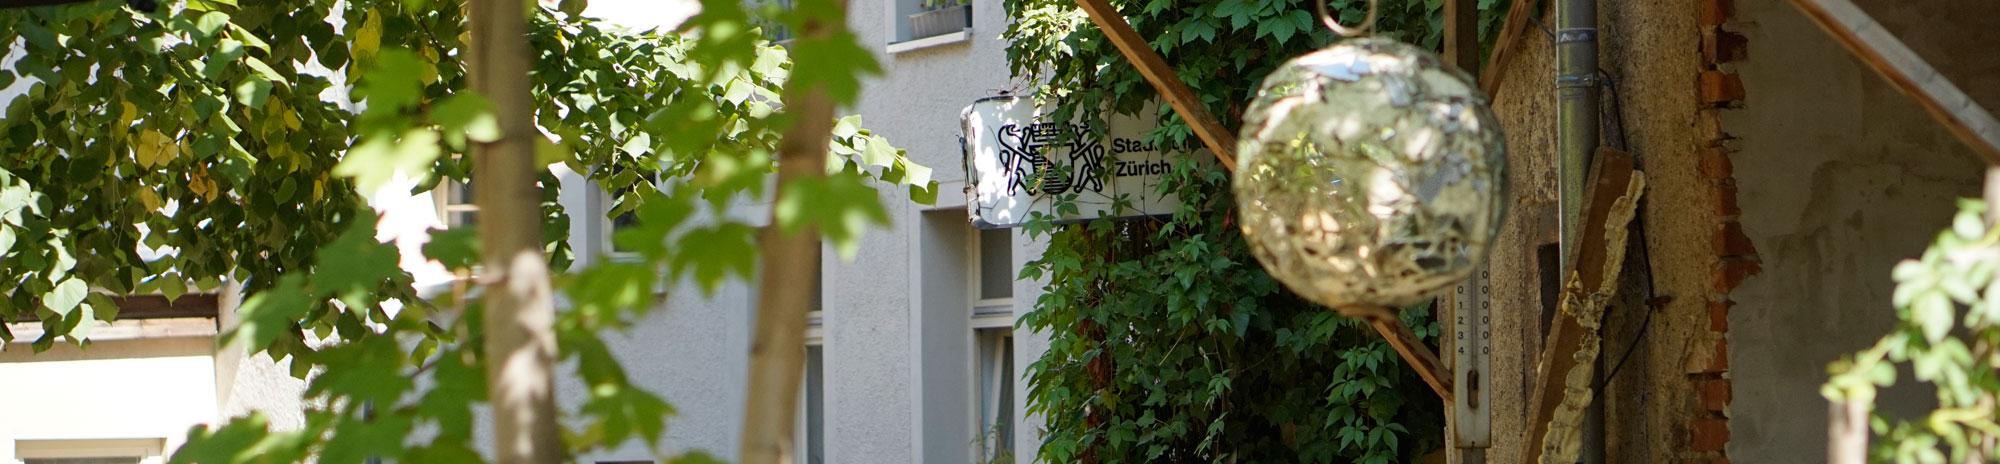 kunZstoffe - urbane Ideenwerkstatt e.V.